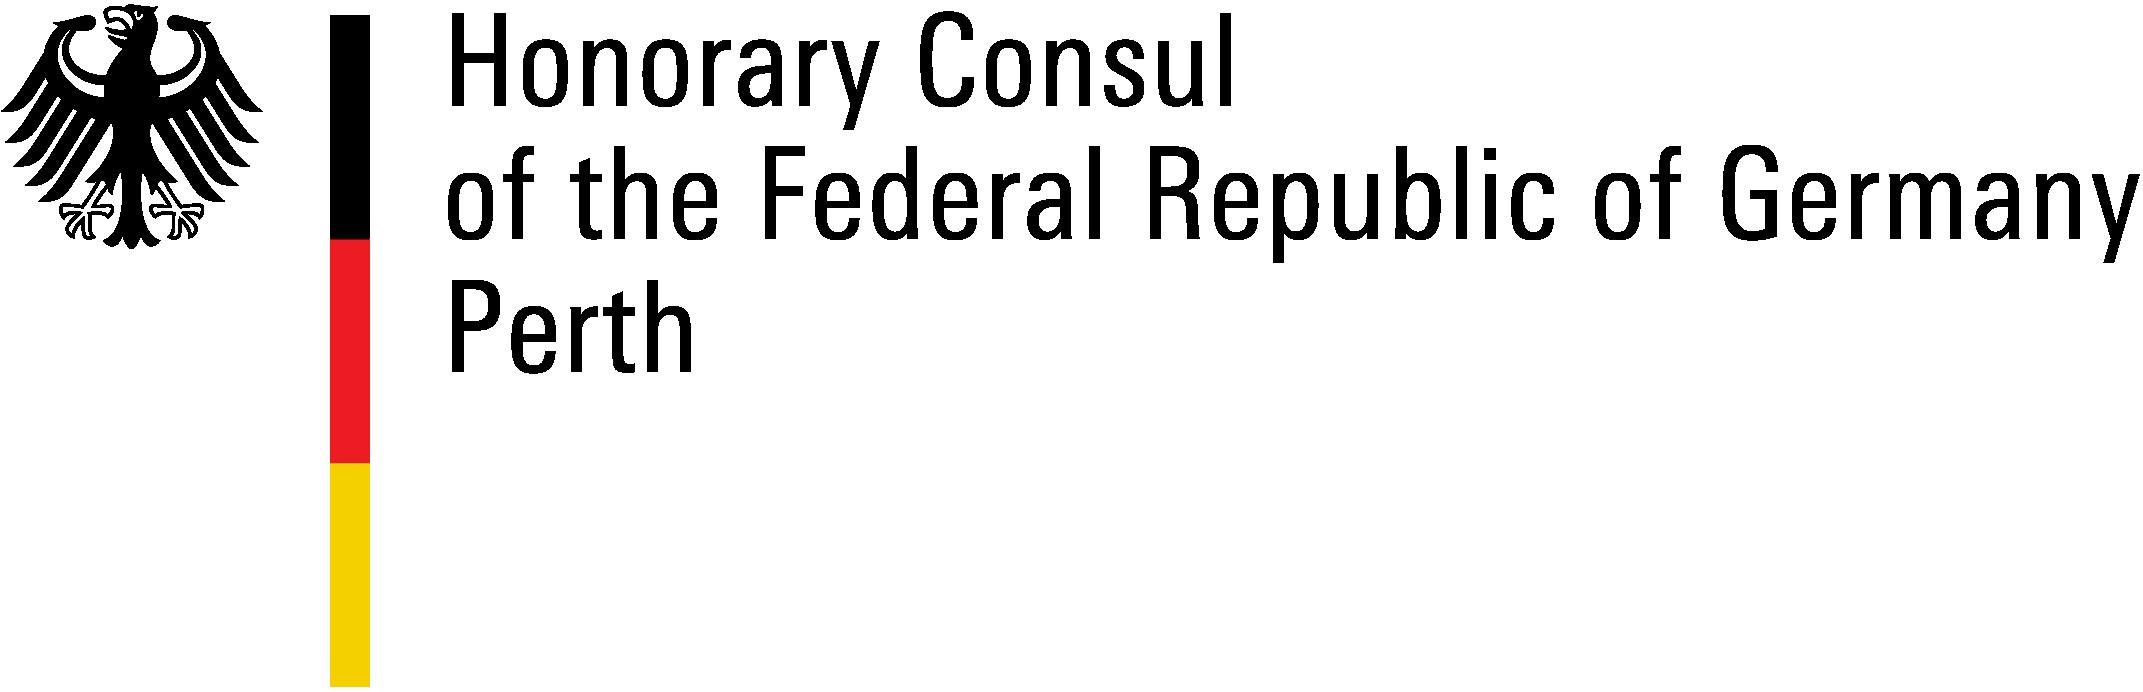 honorary consul perth.png